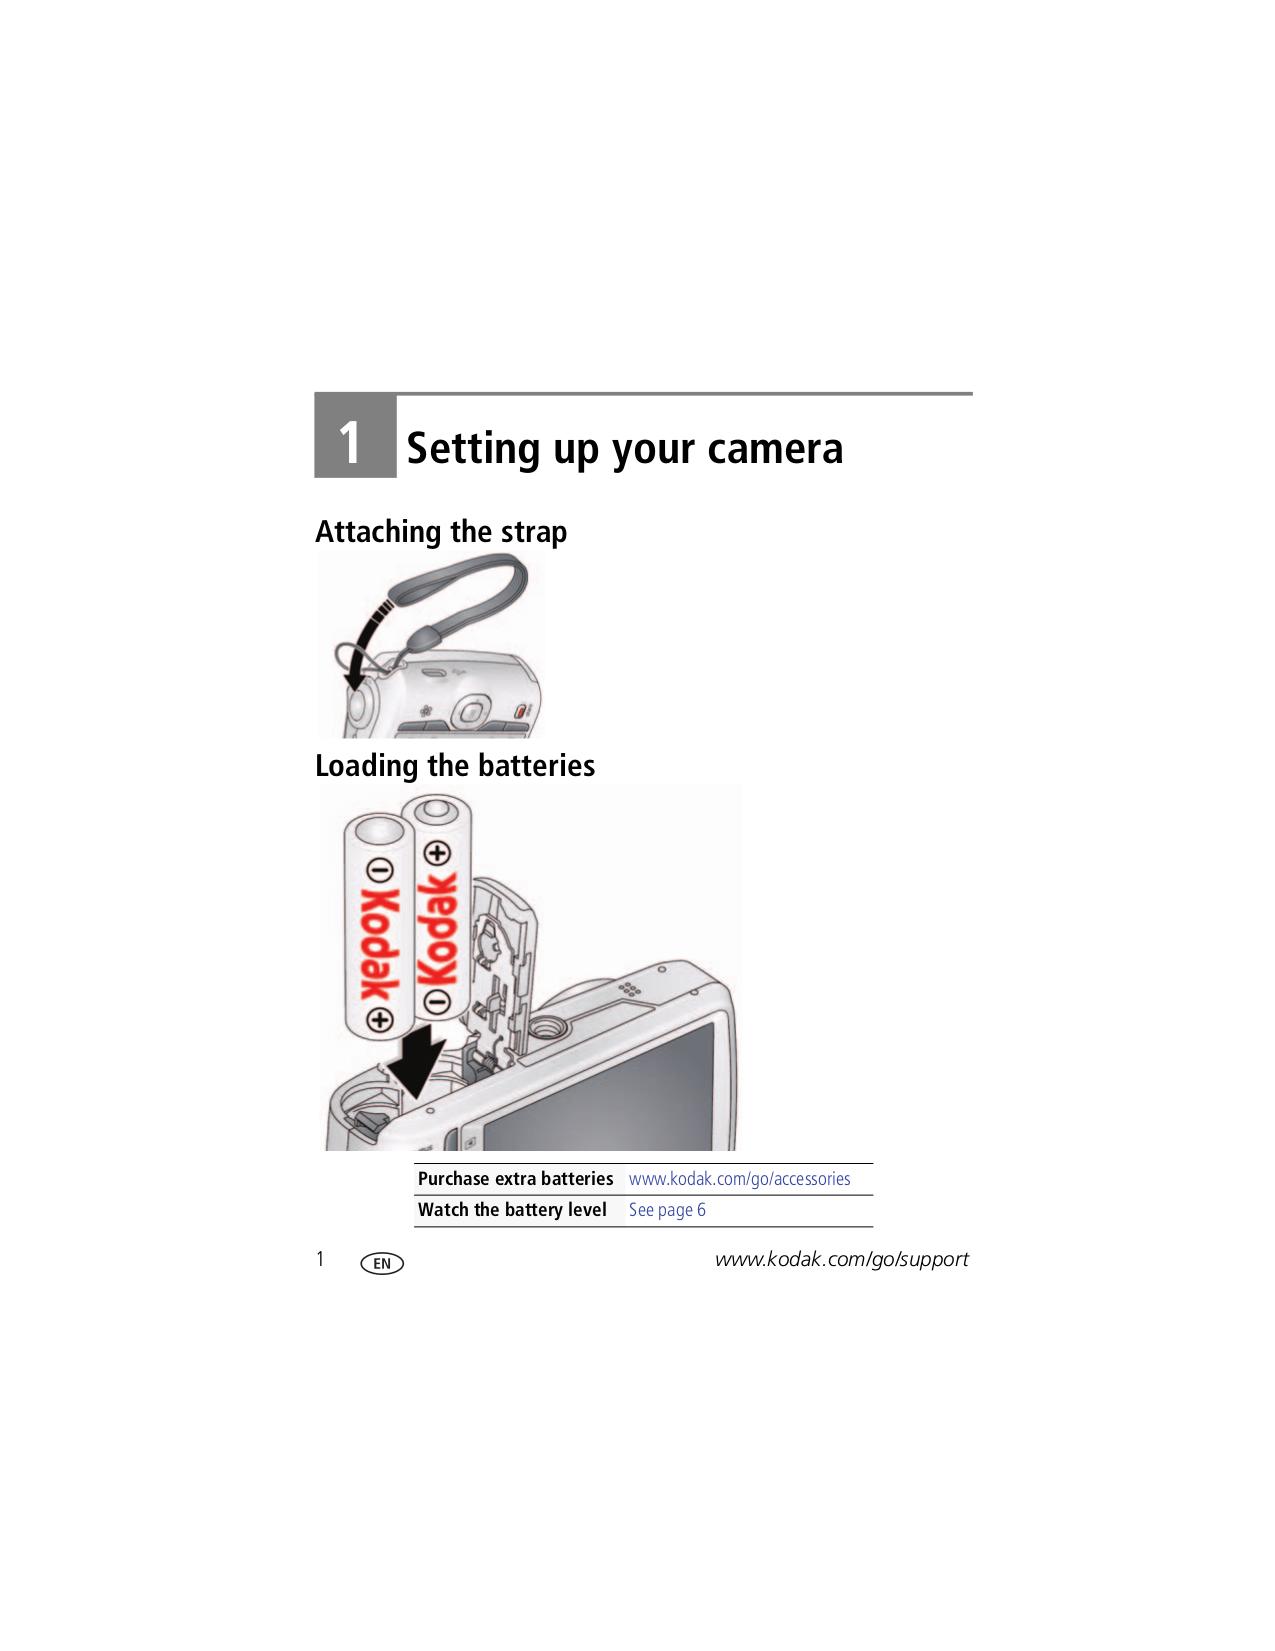 PDF manual for Kodak Digital Camera EasyShare C1530